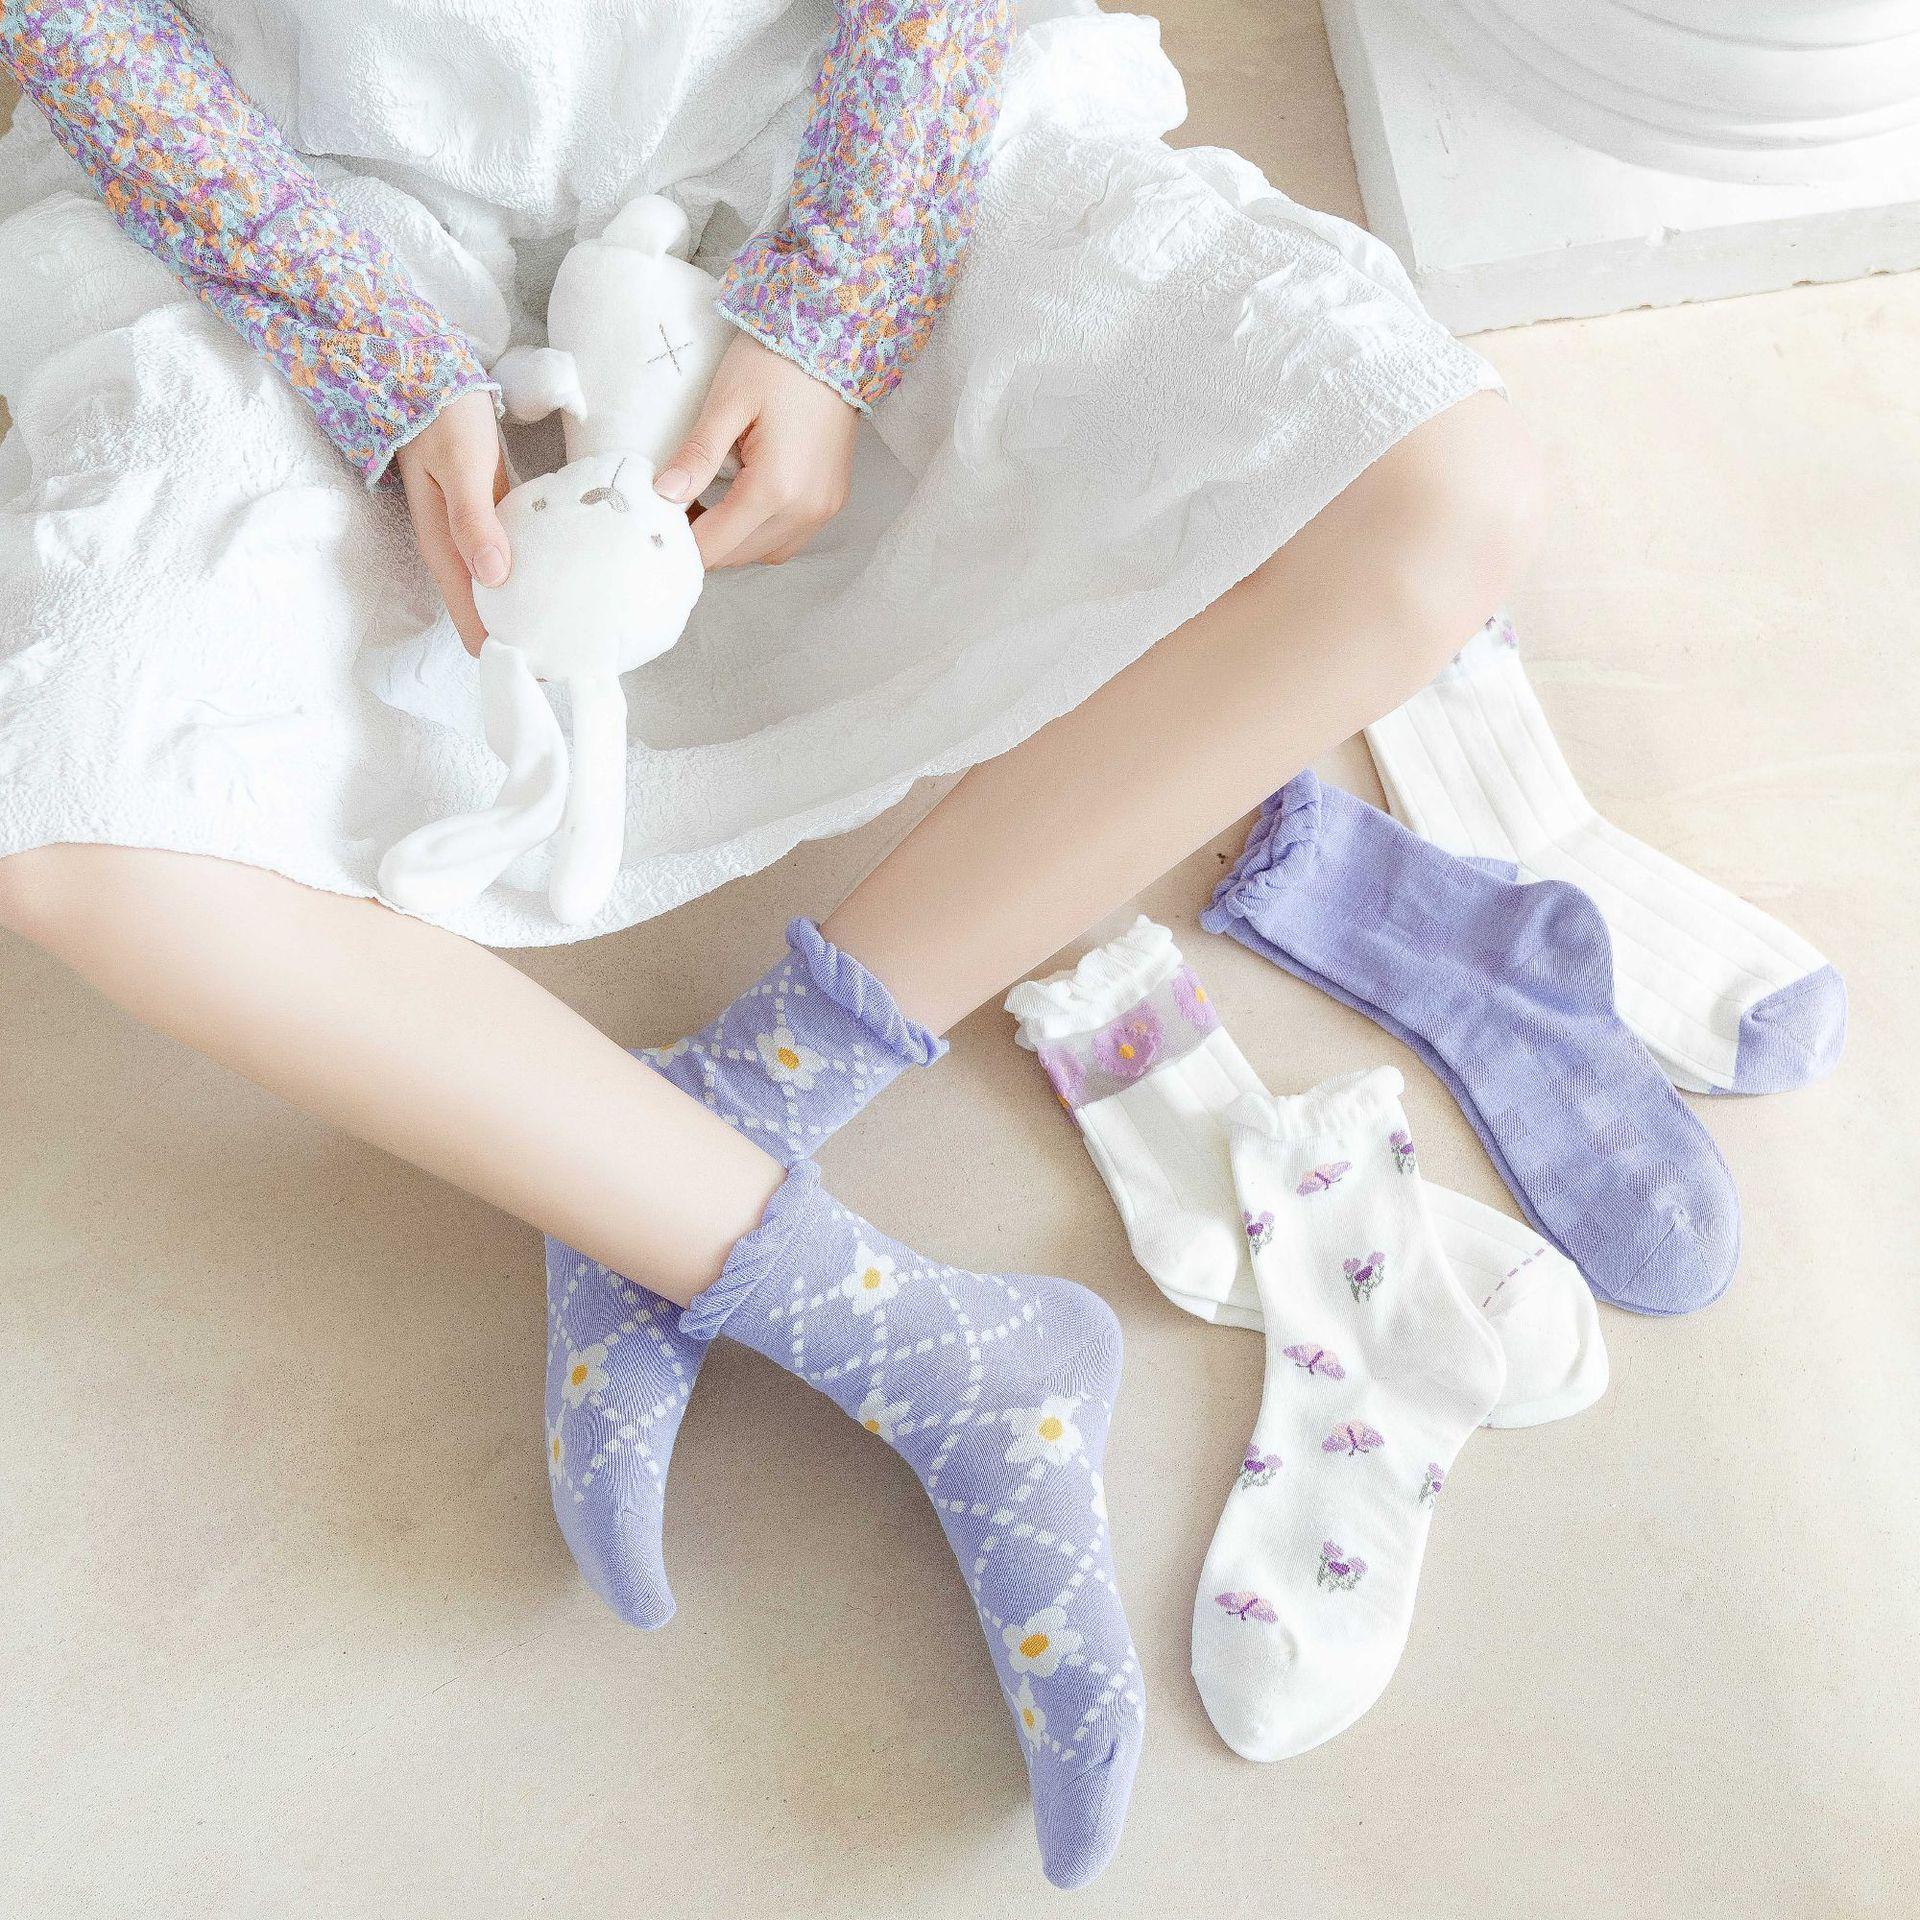 Spring and Summer Socks Female Fashion Trend Korean Cute Printing Fruit Socks Tube Socks Cotton Socks Personality Student Socks